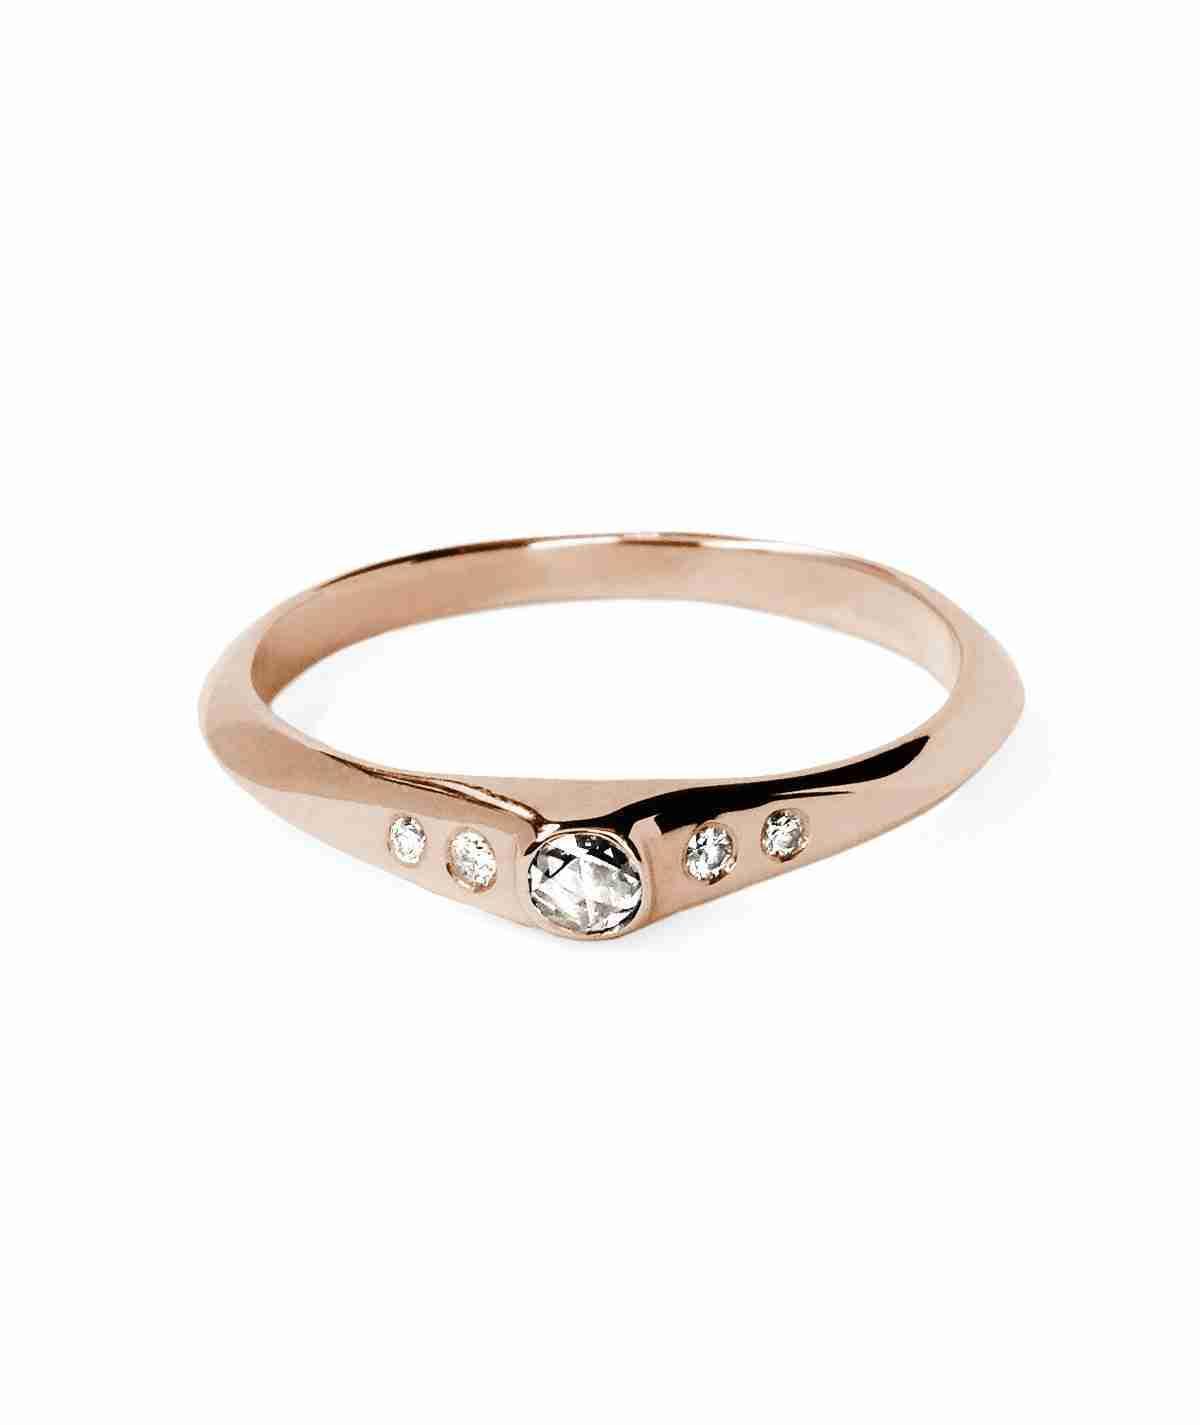 alternative rose cut diamond engagement ring